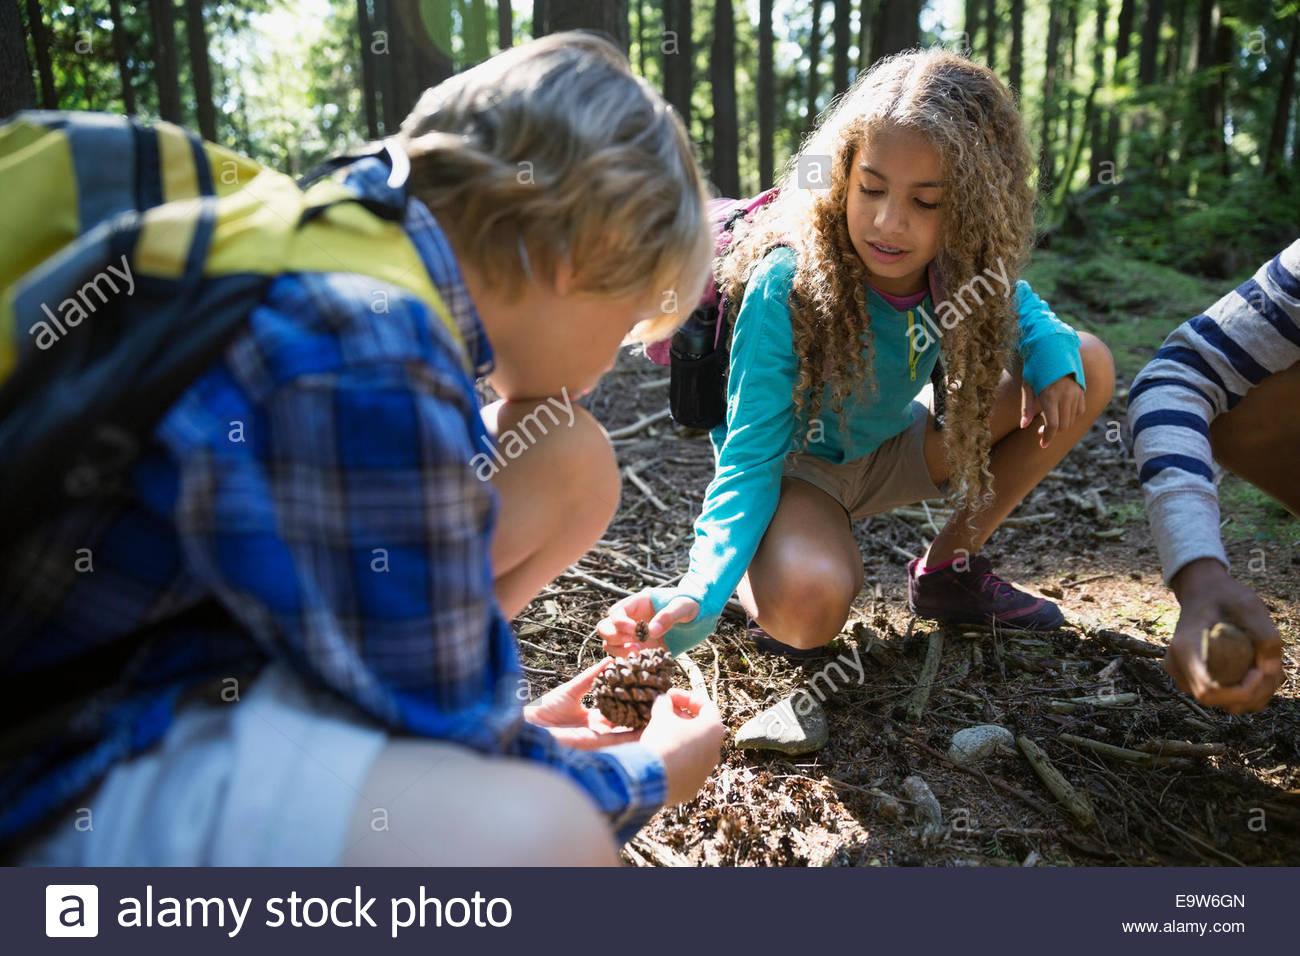 Children examining pine cone in woods - Stock Image